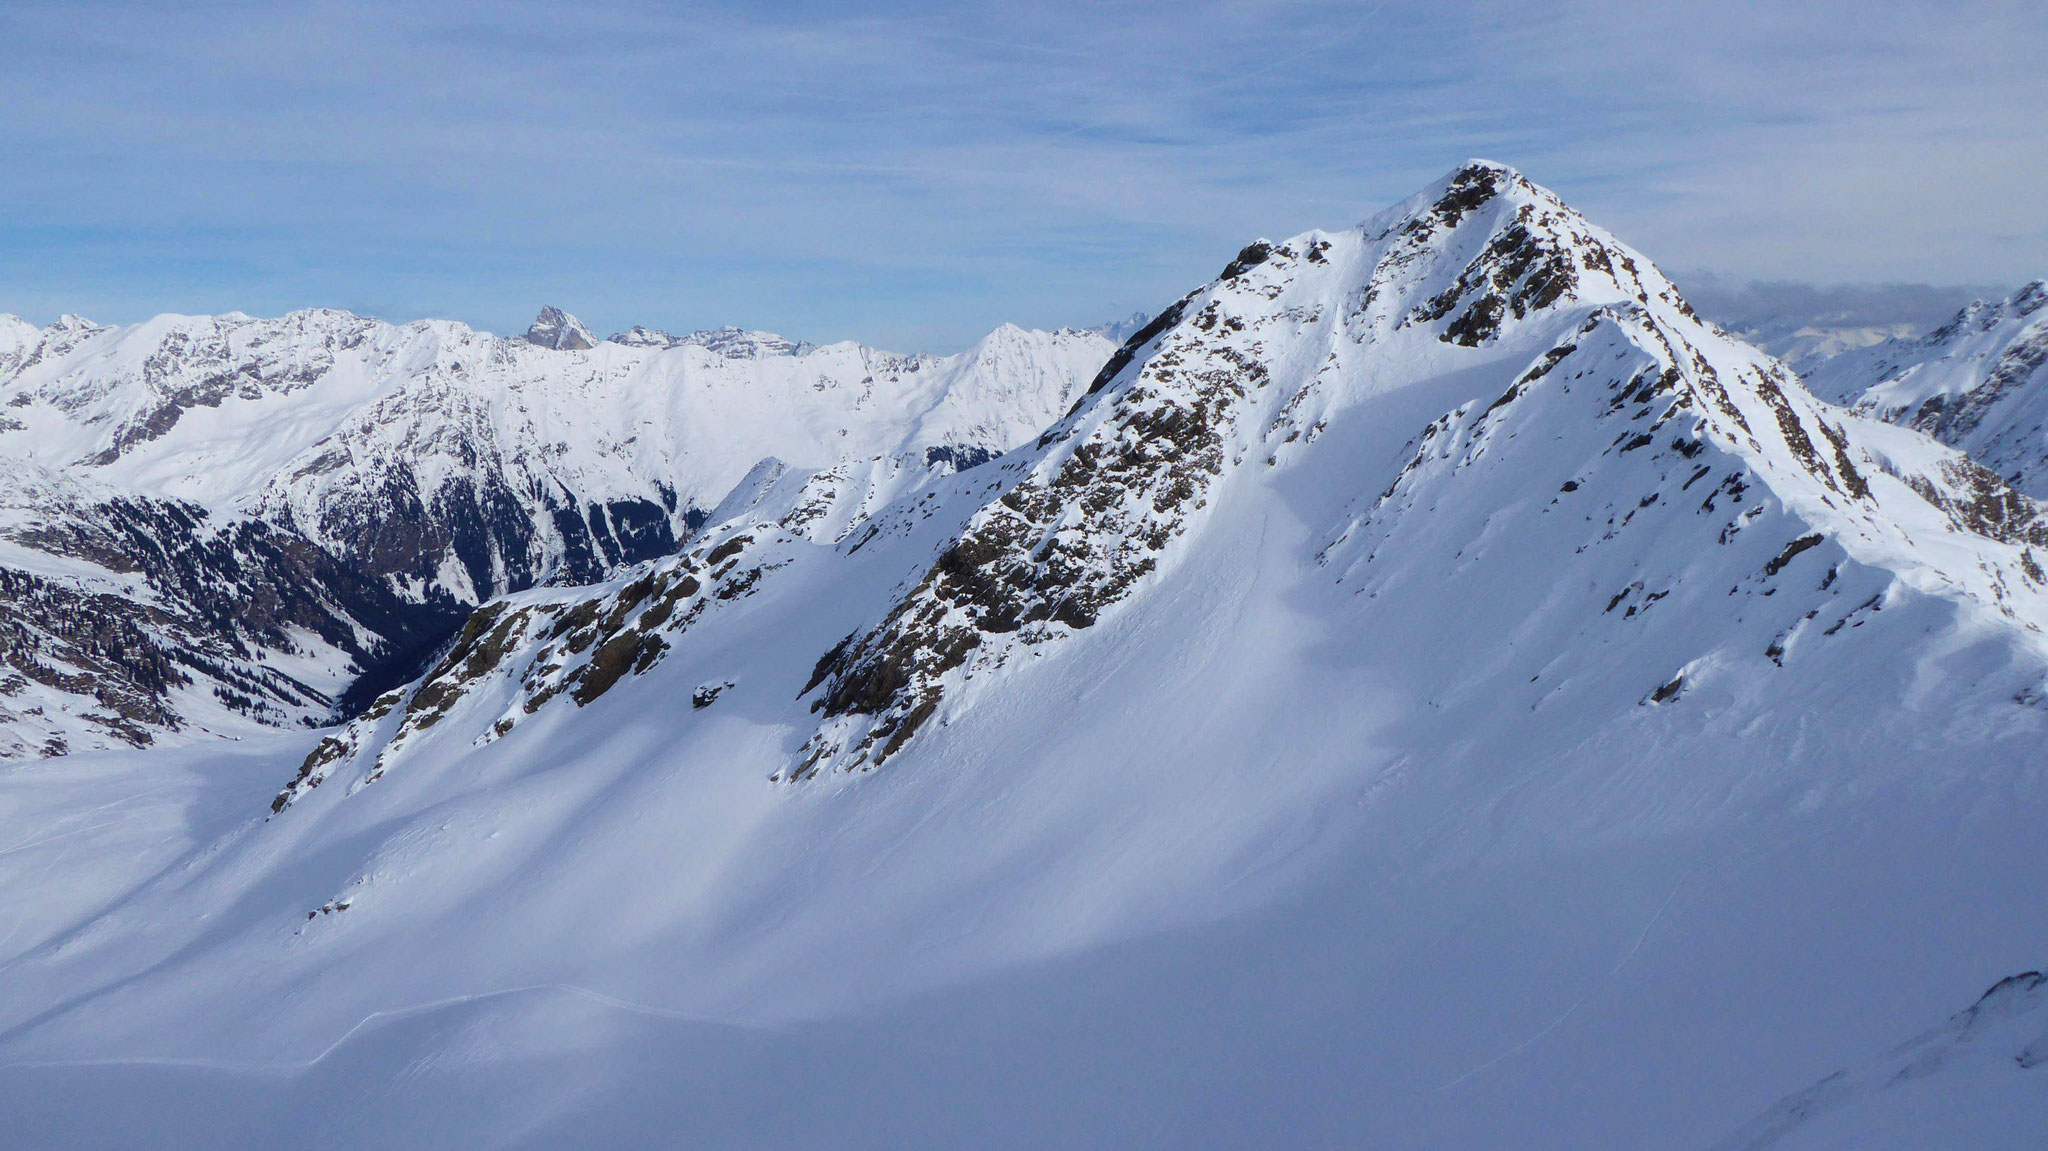 Blick vom namenlosen zum anderen namenlosen Gipfel